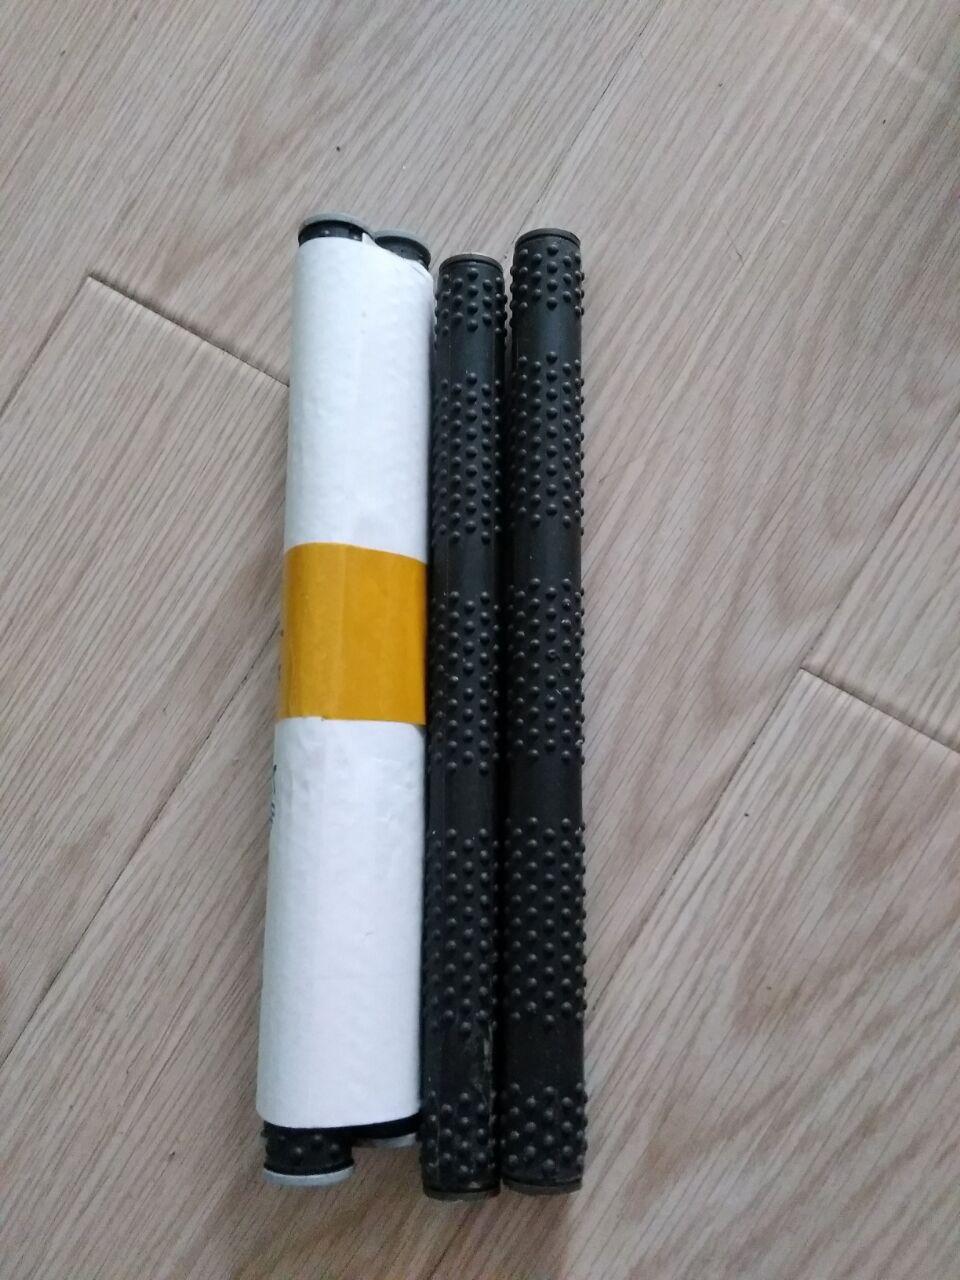 Fuji 330 minilab roller 334C967032Fuji 330 minilab roller 334C967032